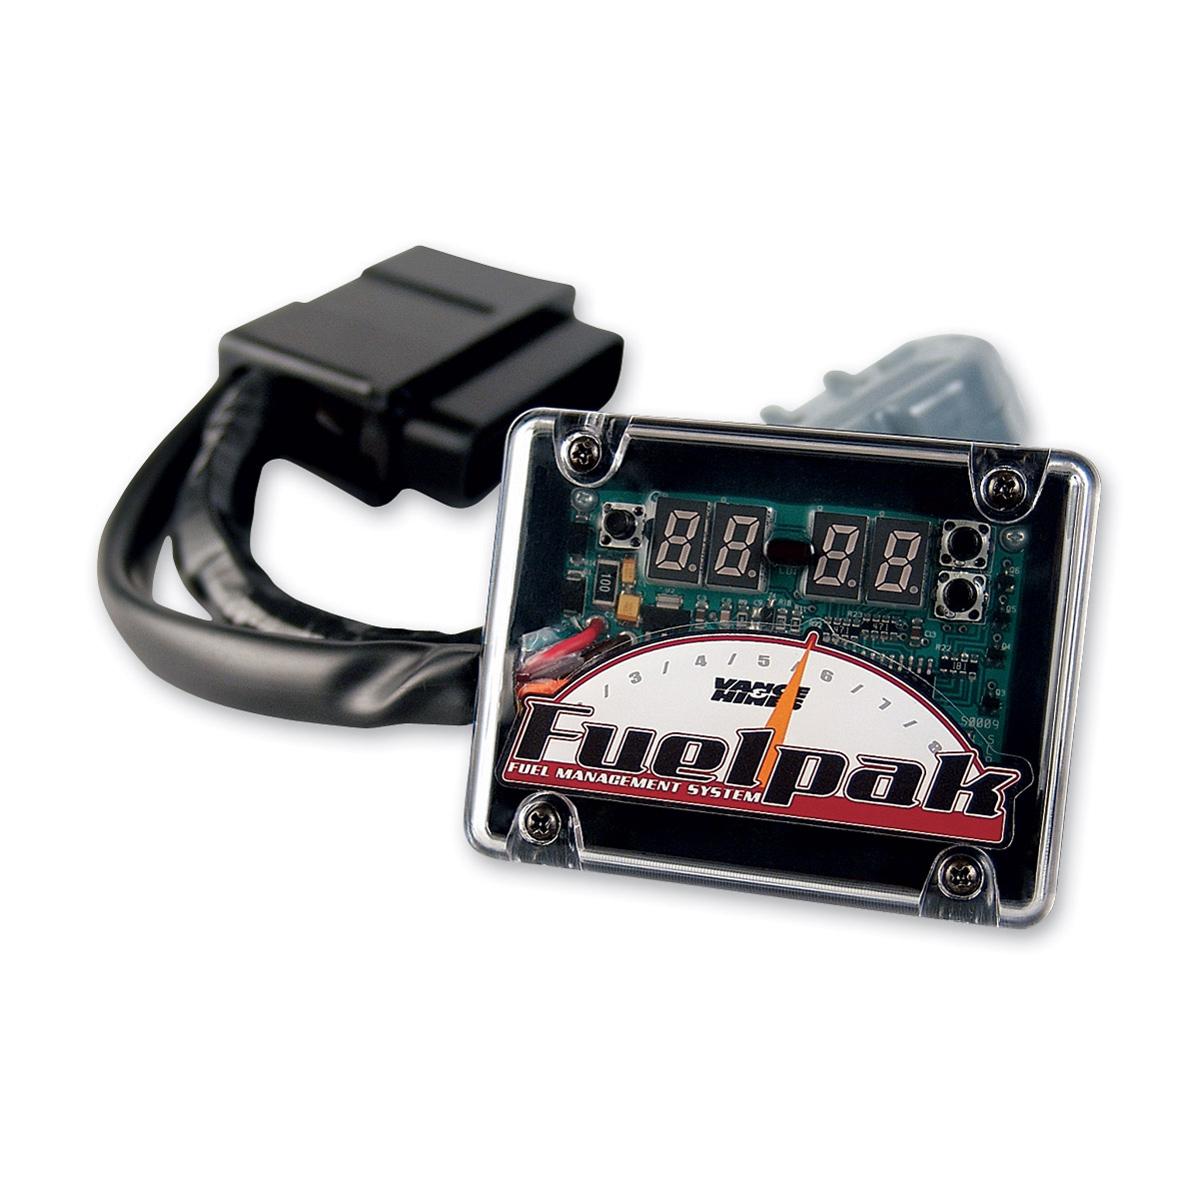 Vance & Hines FuelPak Fuel Management System - 61005B